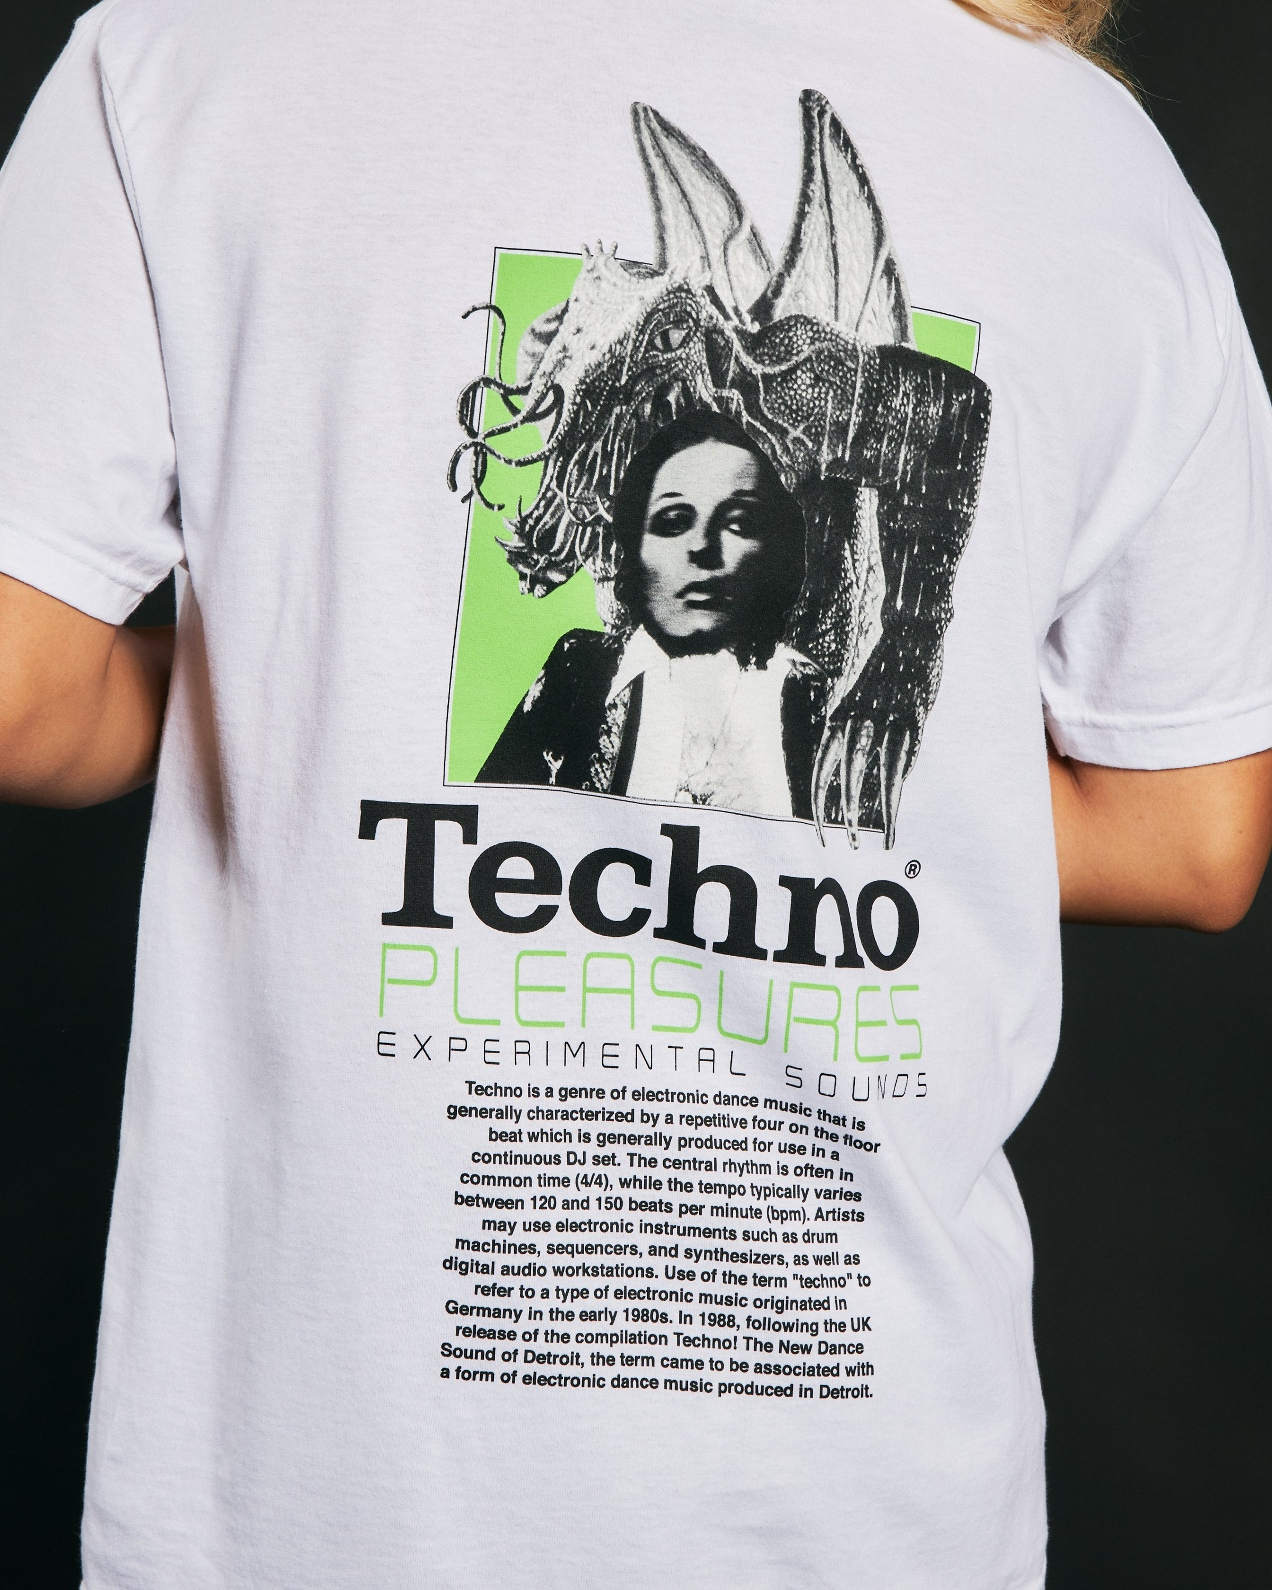 【PLEASURES/プレジャーズ】TECHNO T-SHIRT Tシャツ / WHITE